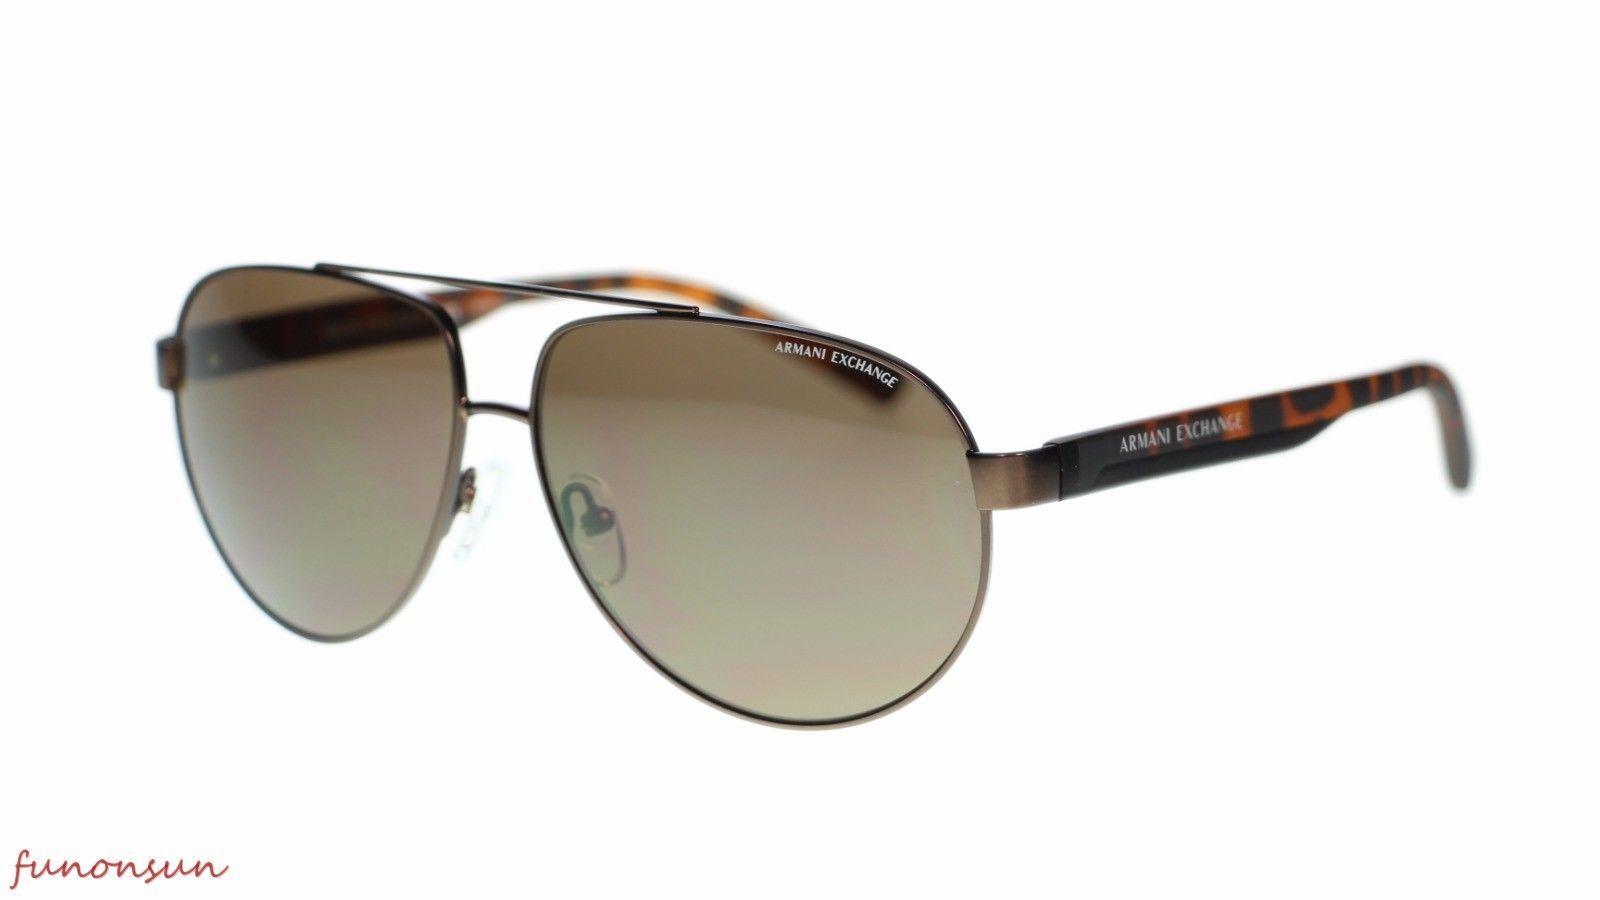 06a86d42b16 Armani Exchange Men Sunglasses AX2022 609873 and 15 similar items. 10